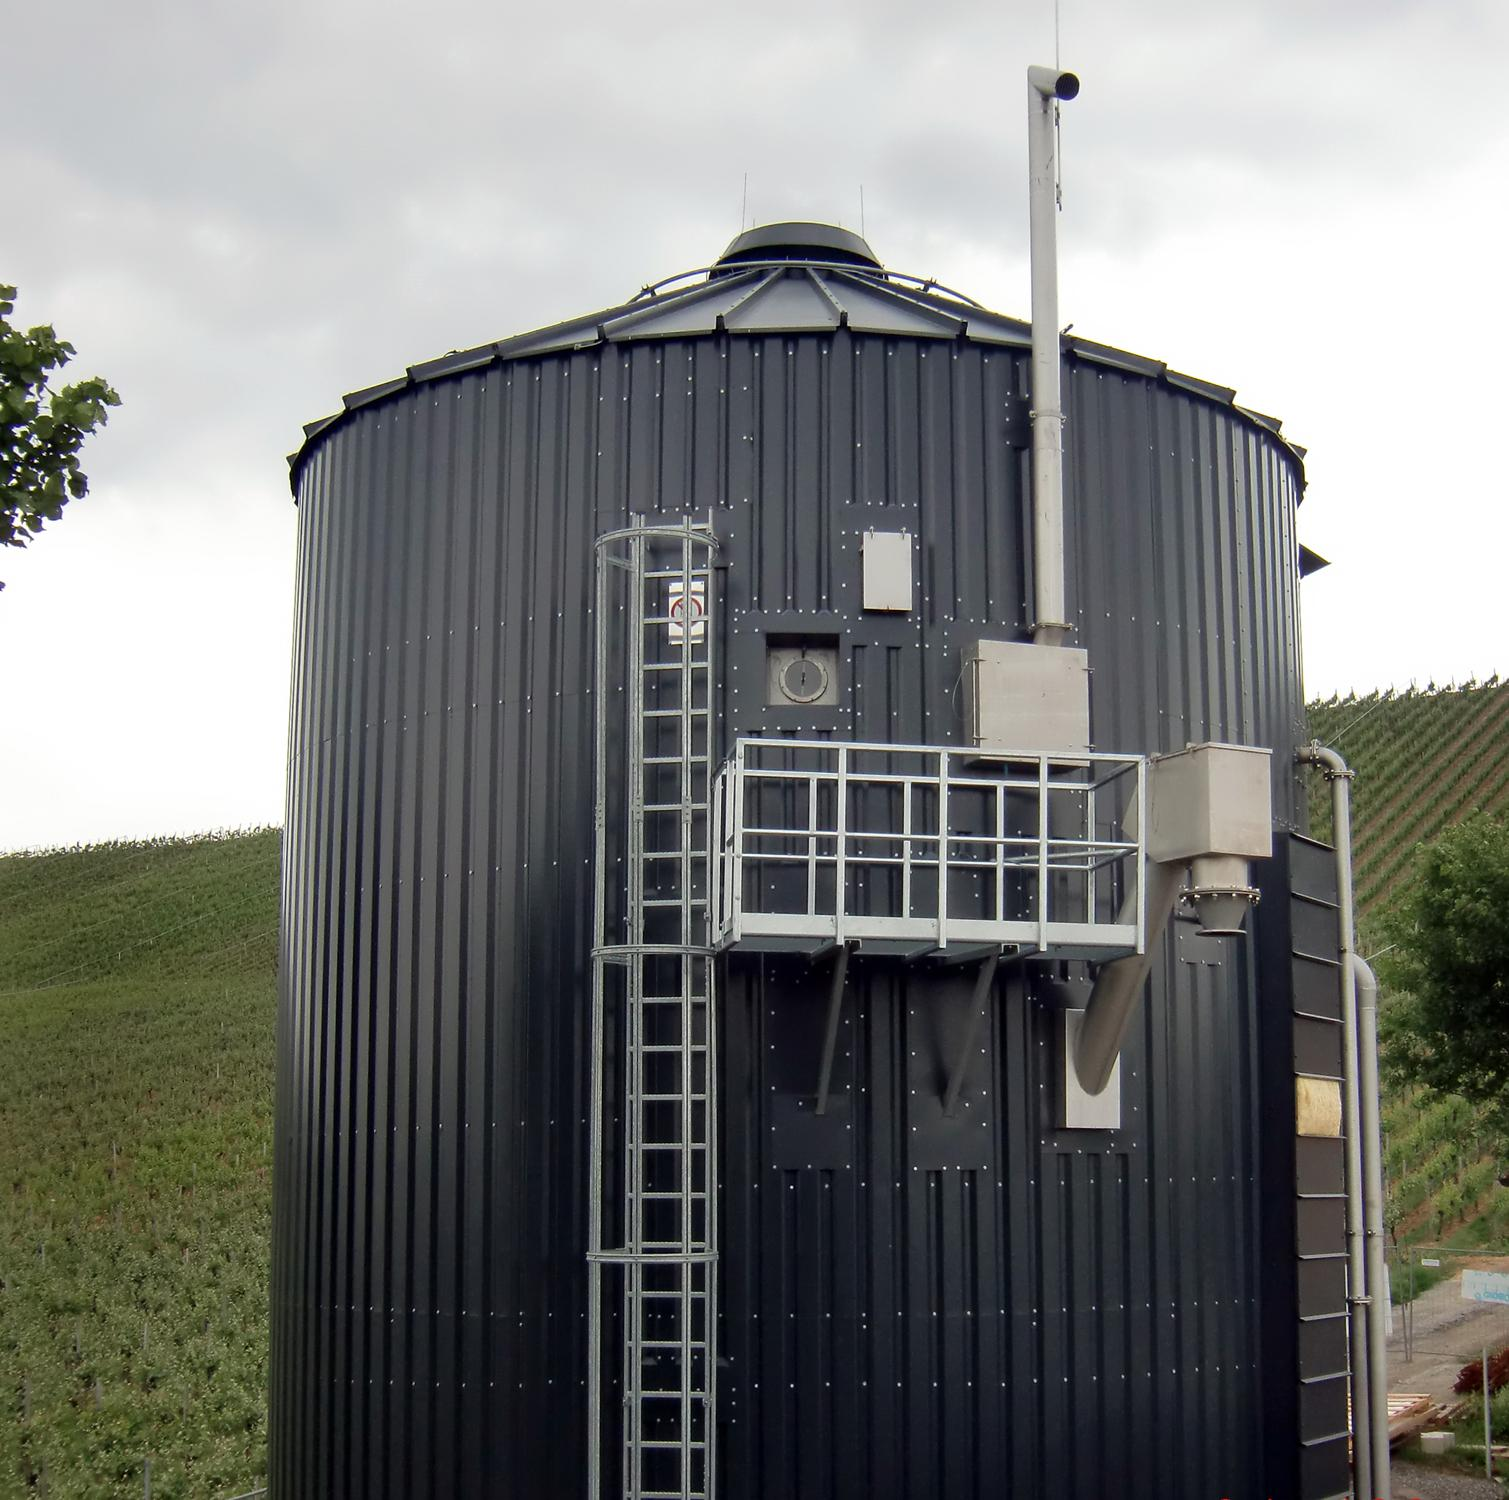 A Lipp spiral seam biodigester tank